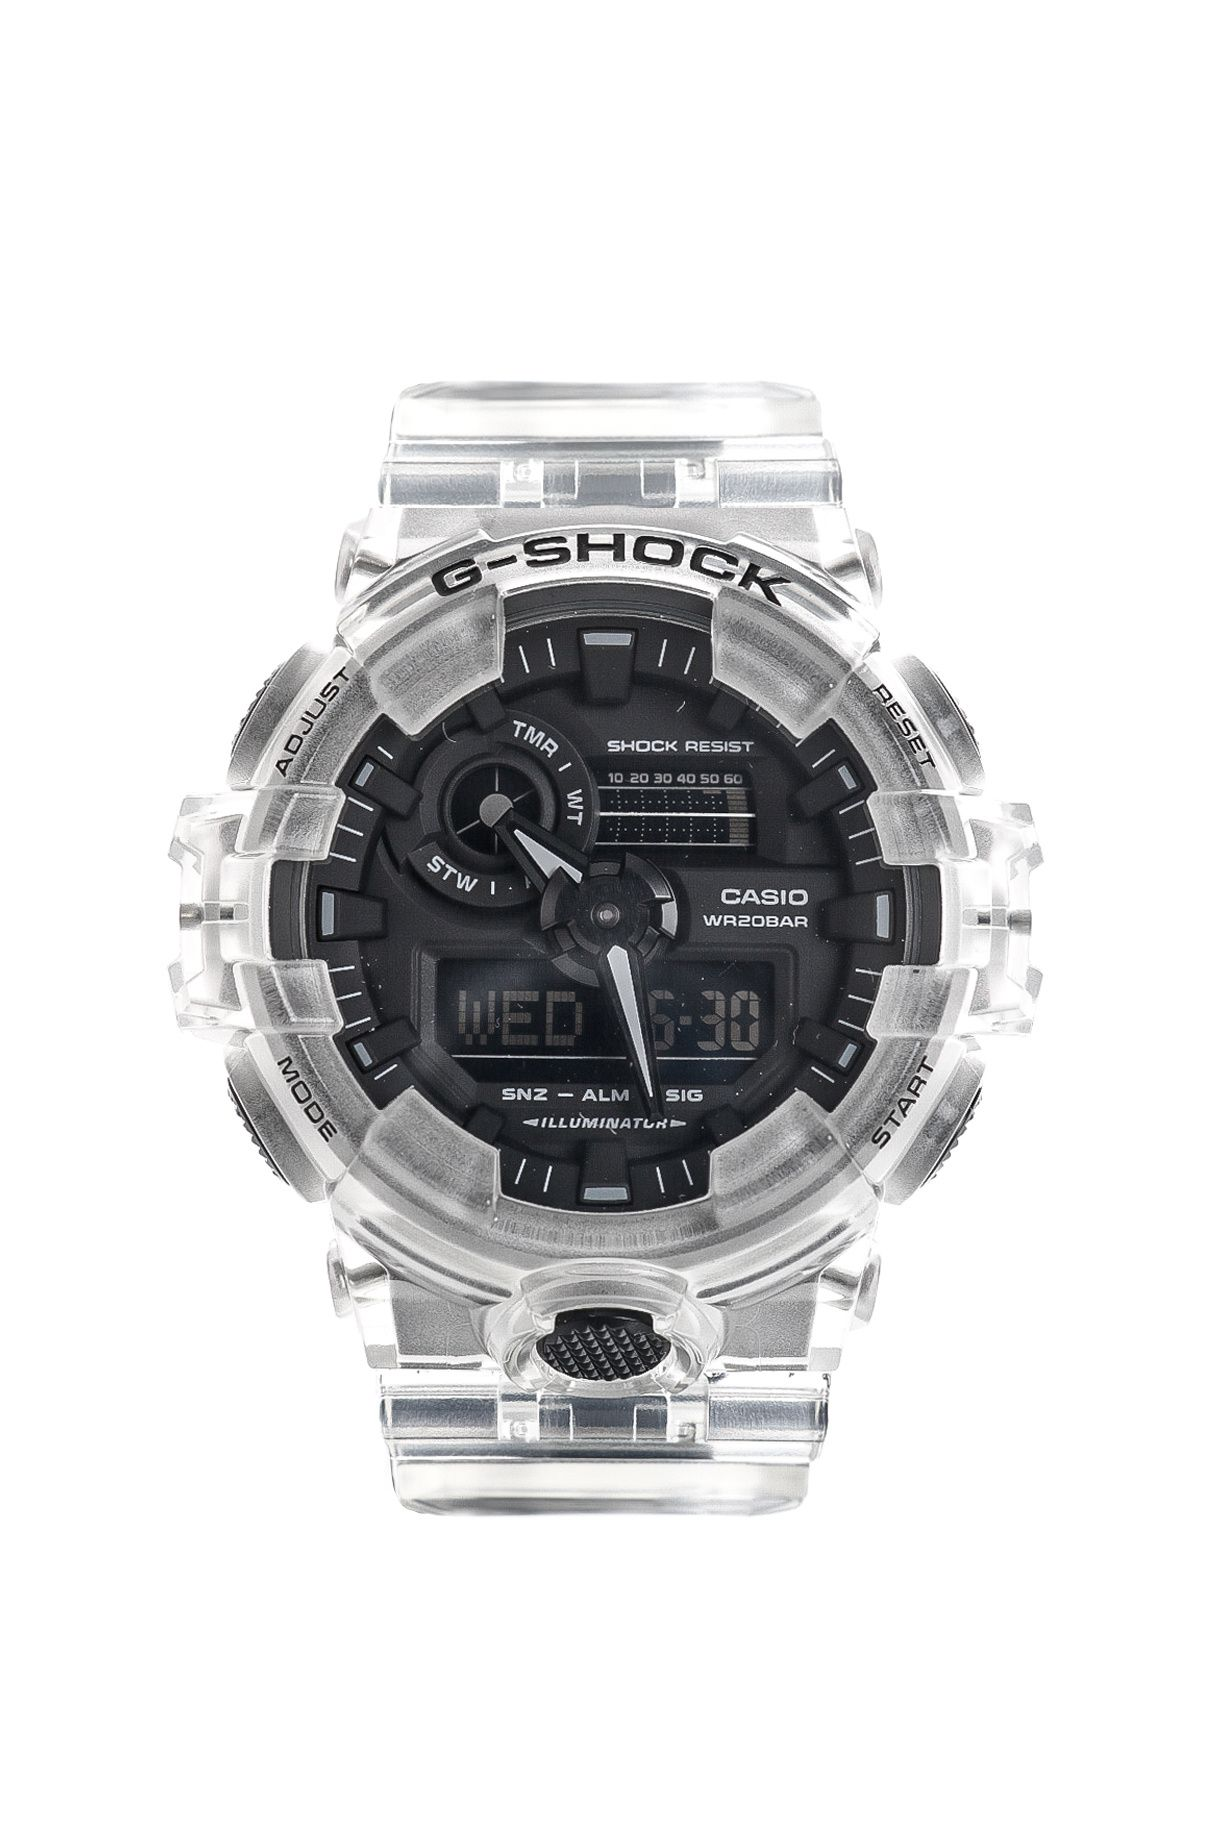 Afbeelding van Casio Horloge G-SHOCK GA-700SKE Transparant White